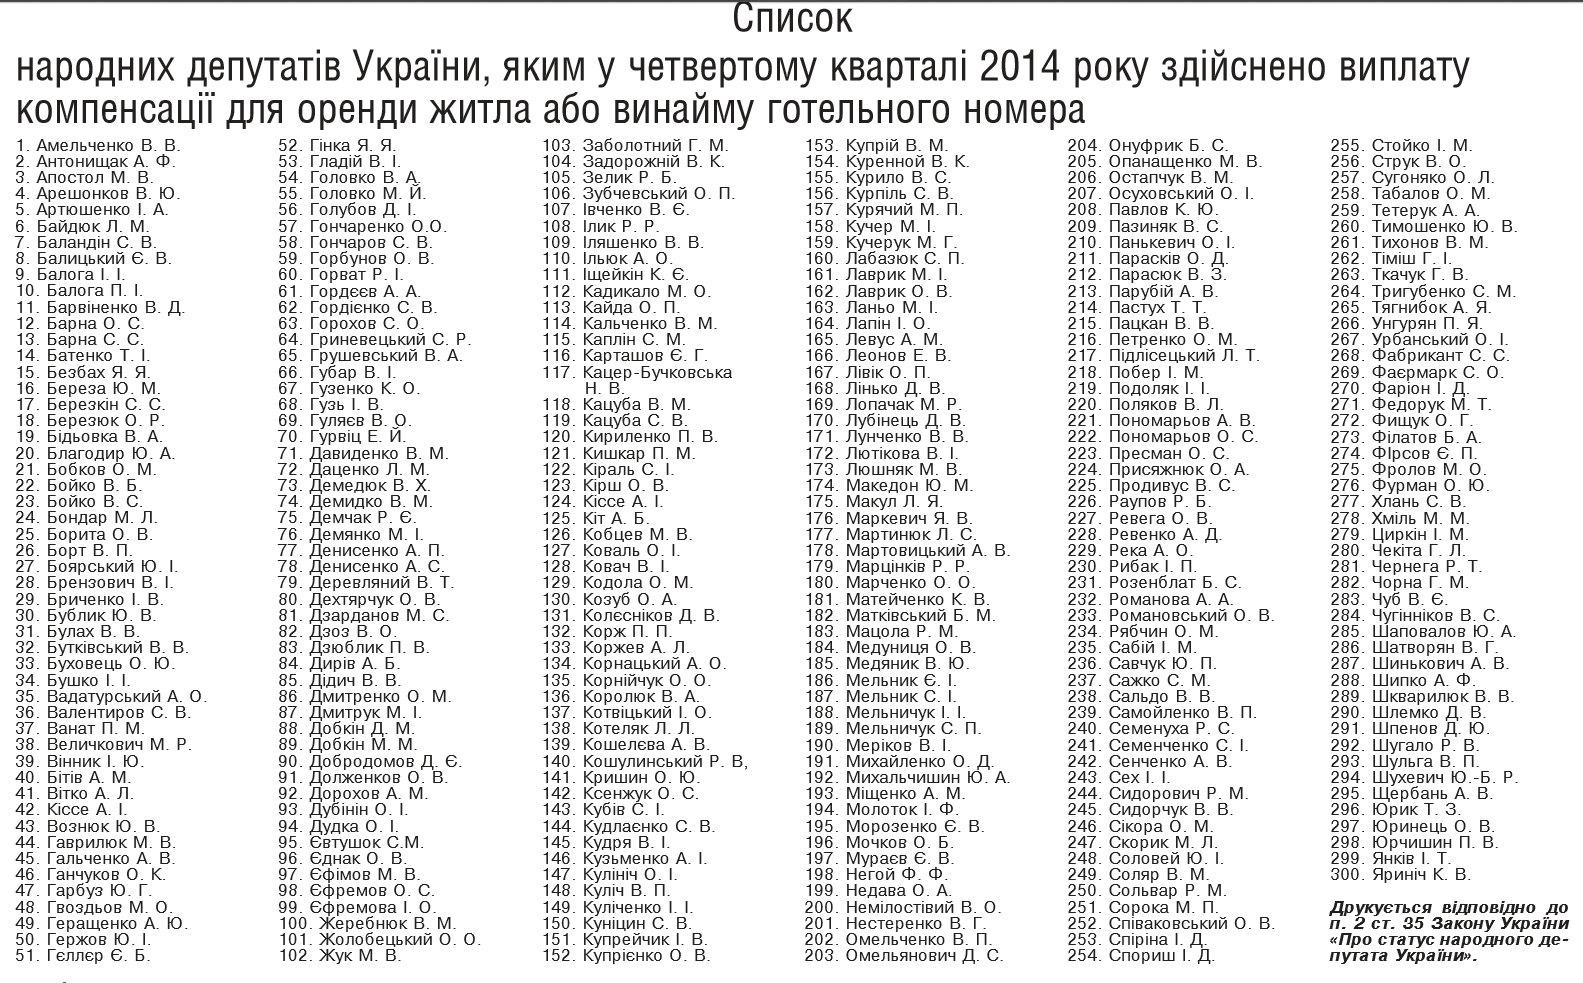 300 из 450 депутатов живут за счет народа